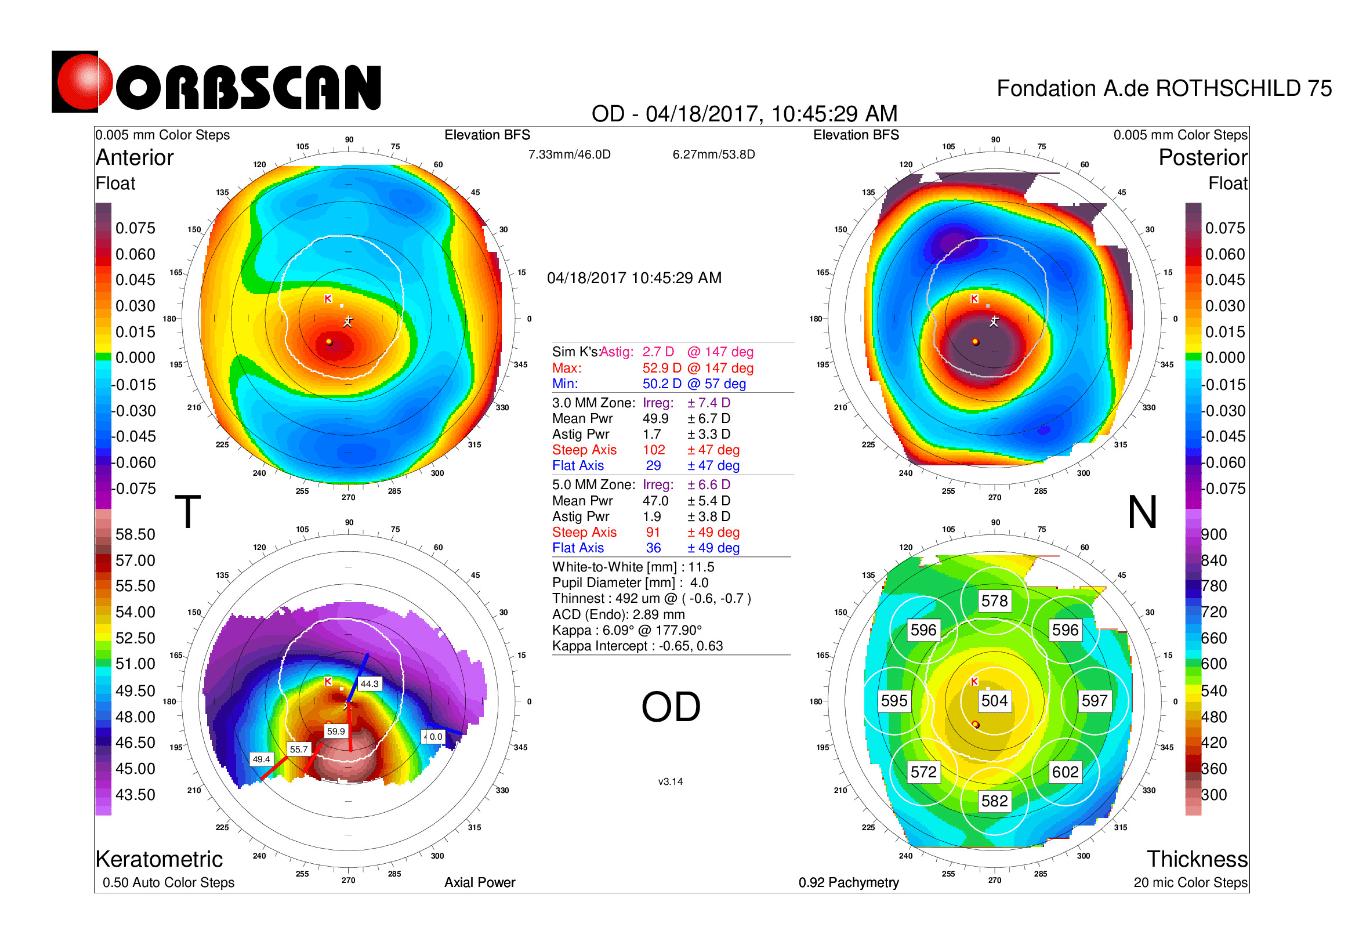 Orbscan map of an advanced keratoconus eye